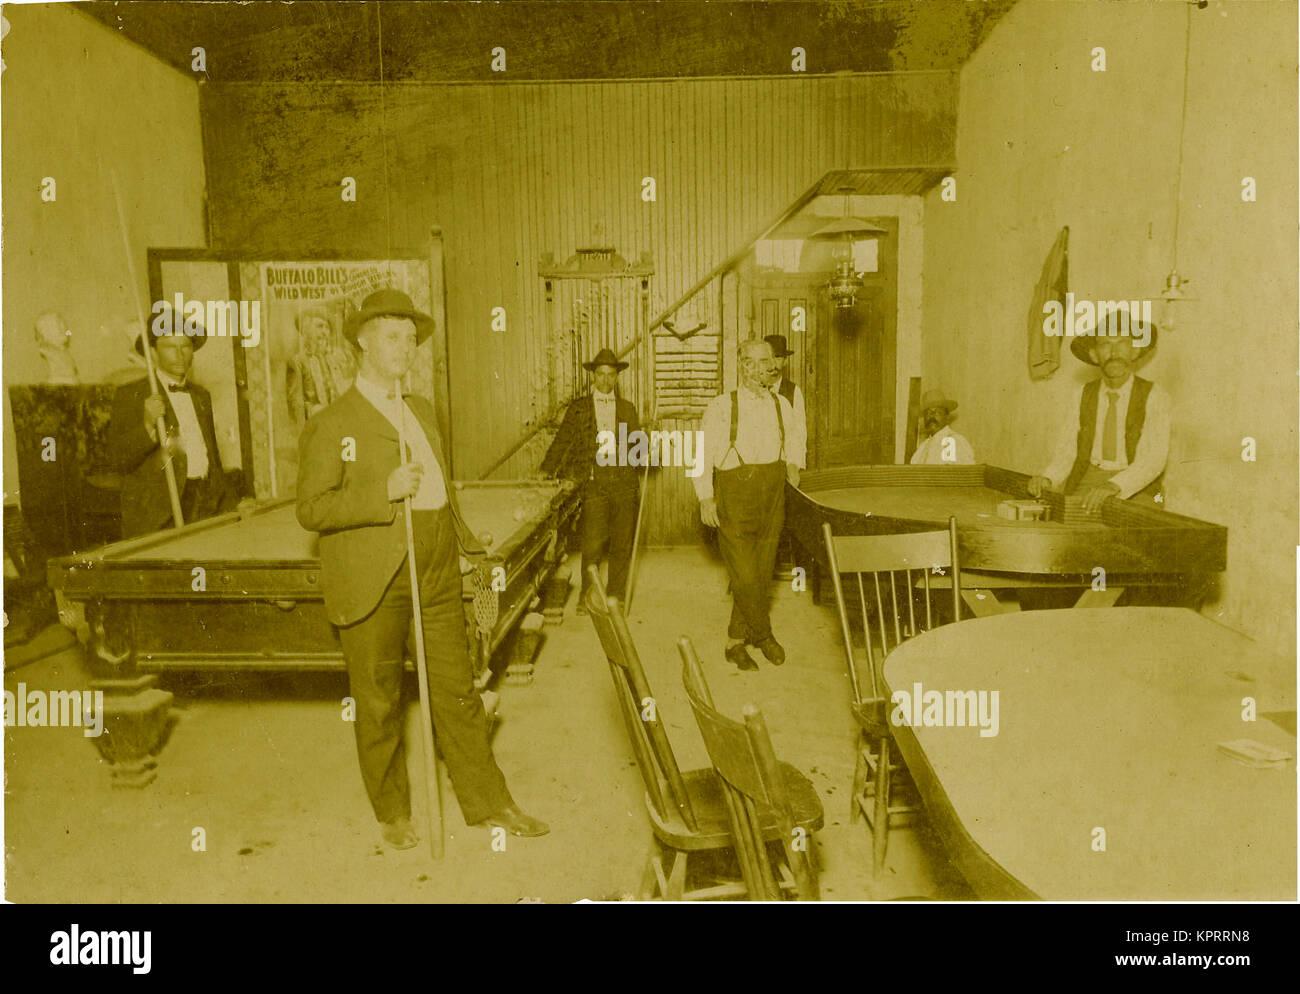 Saloon, Gambling Hall, & Poster Of Buffalo Bill, 1915 - Stock Image